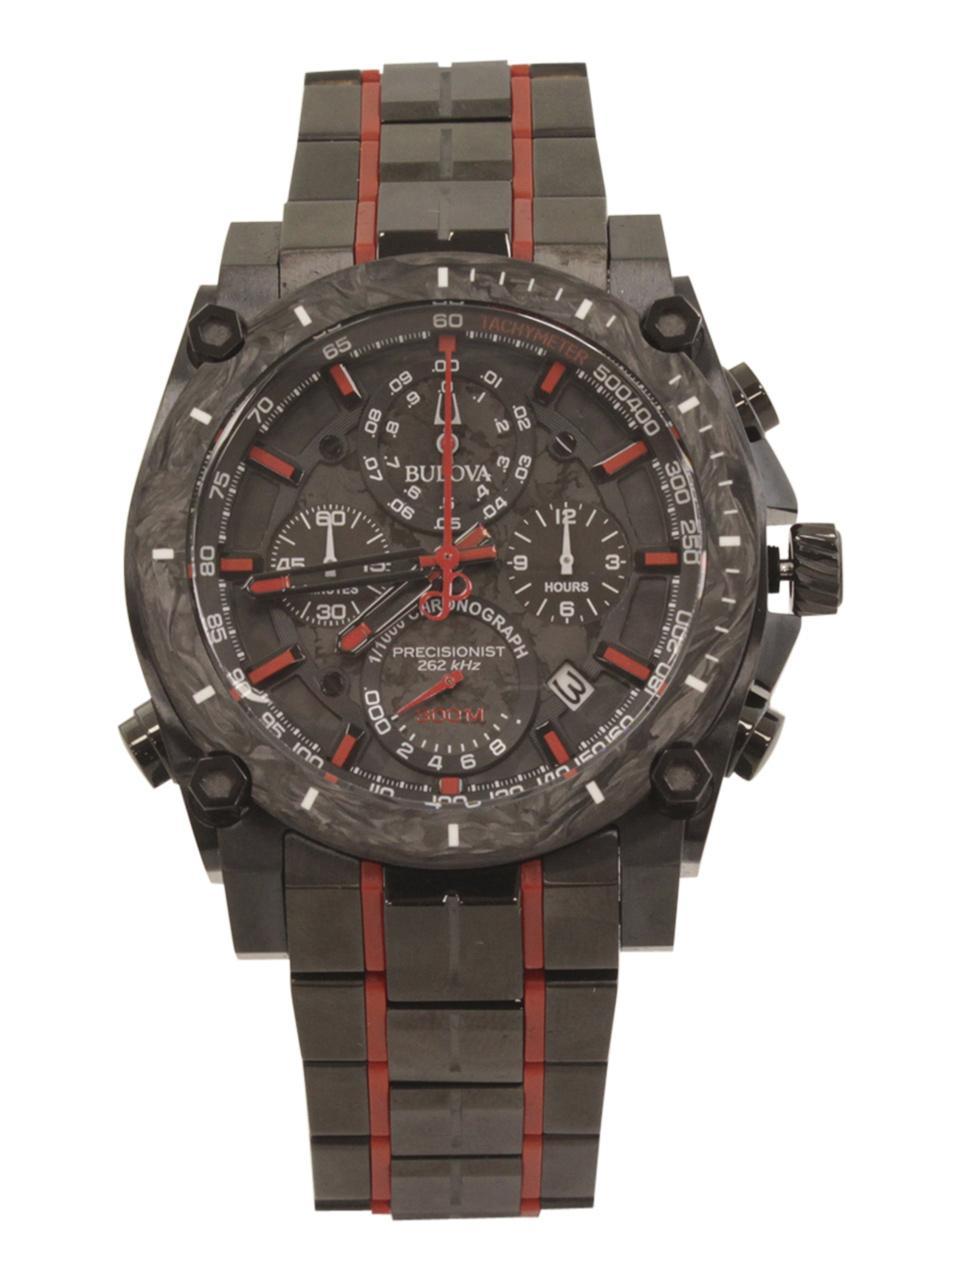 Image of Bulova Men s Precisionist 98B313 Black Red Chronograph Analog Watch